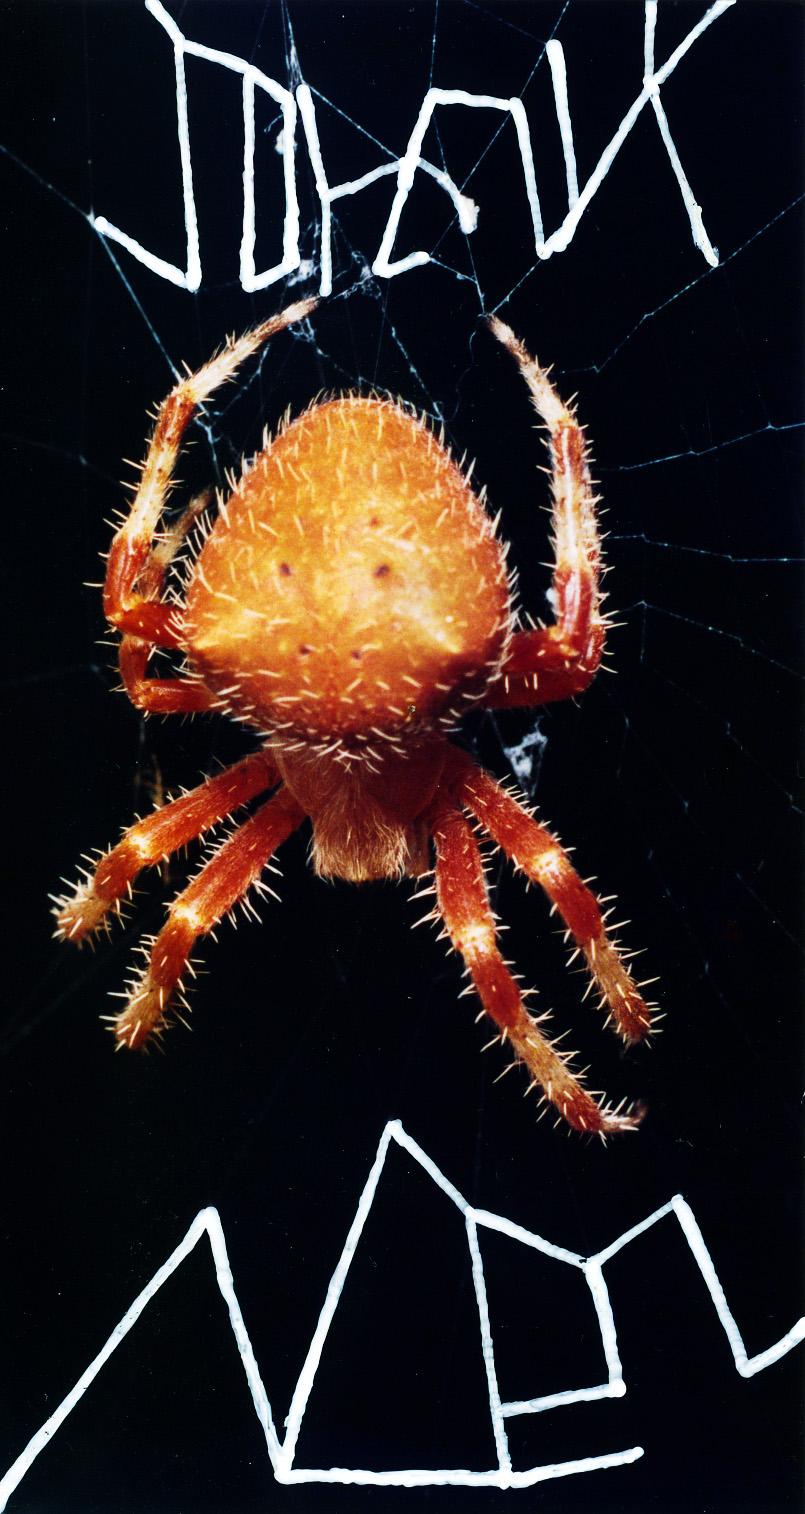 "Holiday greetings from a European (apparently French) Garden Spider (<a href=""http://www.spiders.us/species/araneus-diadematus/""><i><u>Araneus diadematus</u></i></a>) in Santa Barbara"